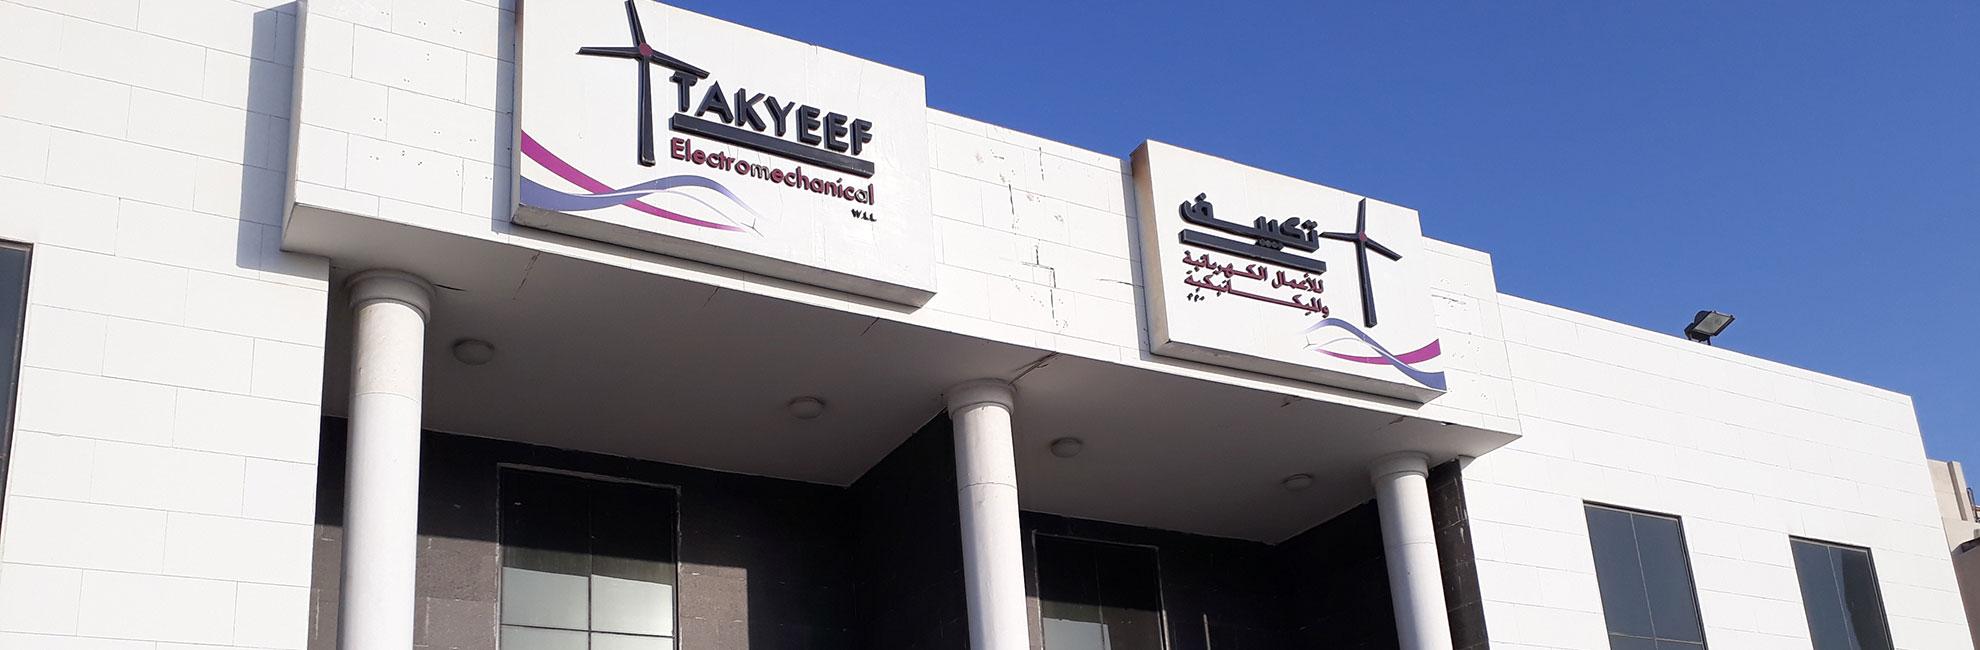 Takyeef Electromechanical W L L